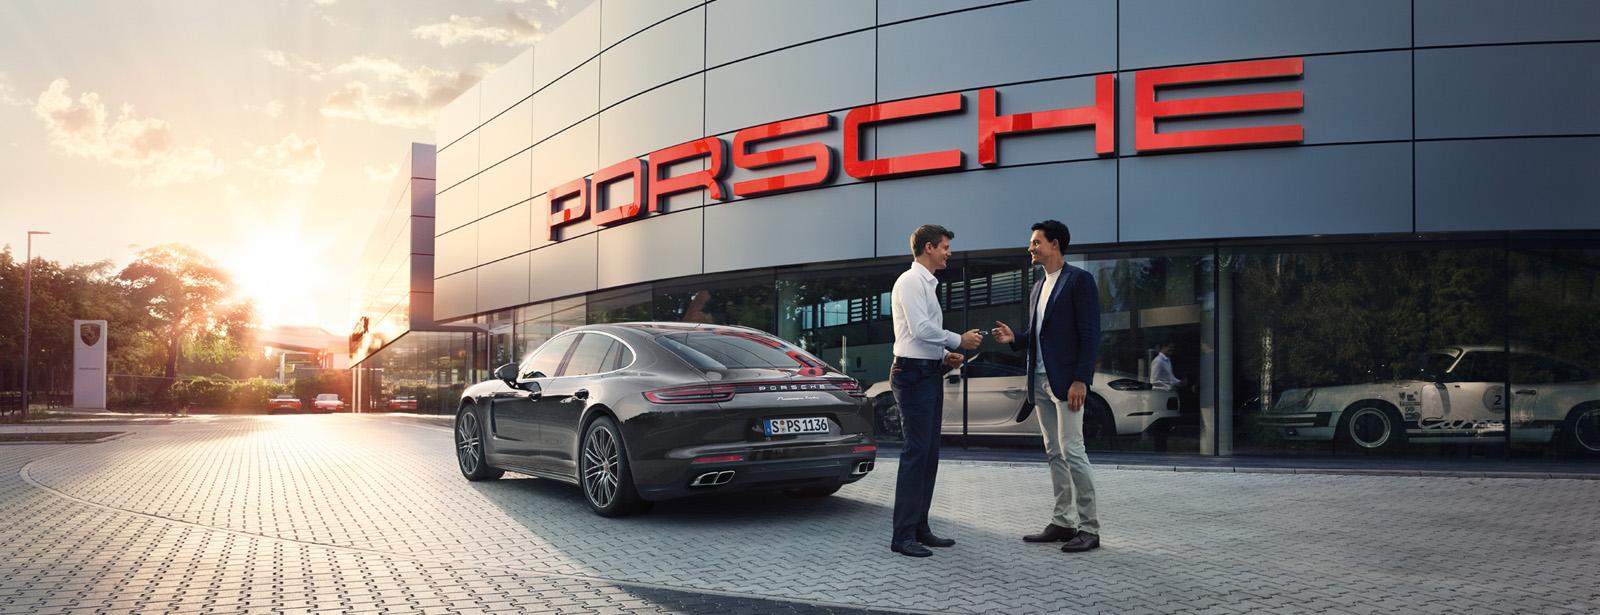 Porsche Service | Servicehotline